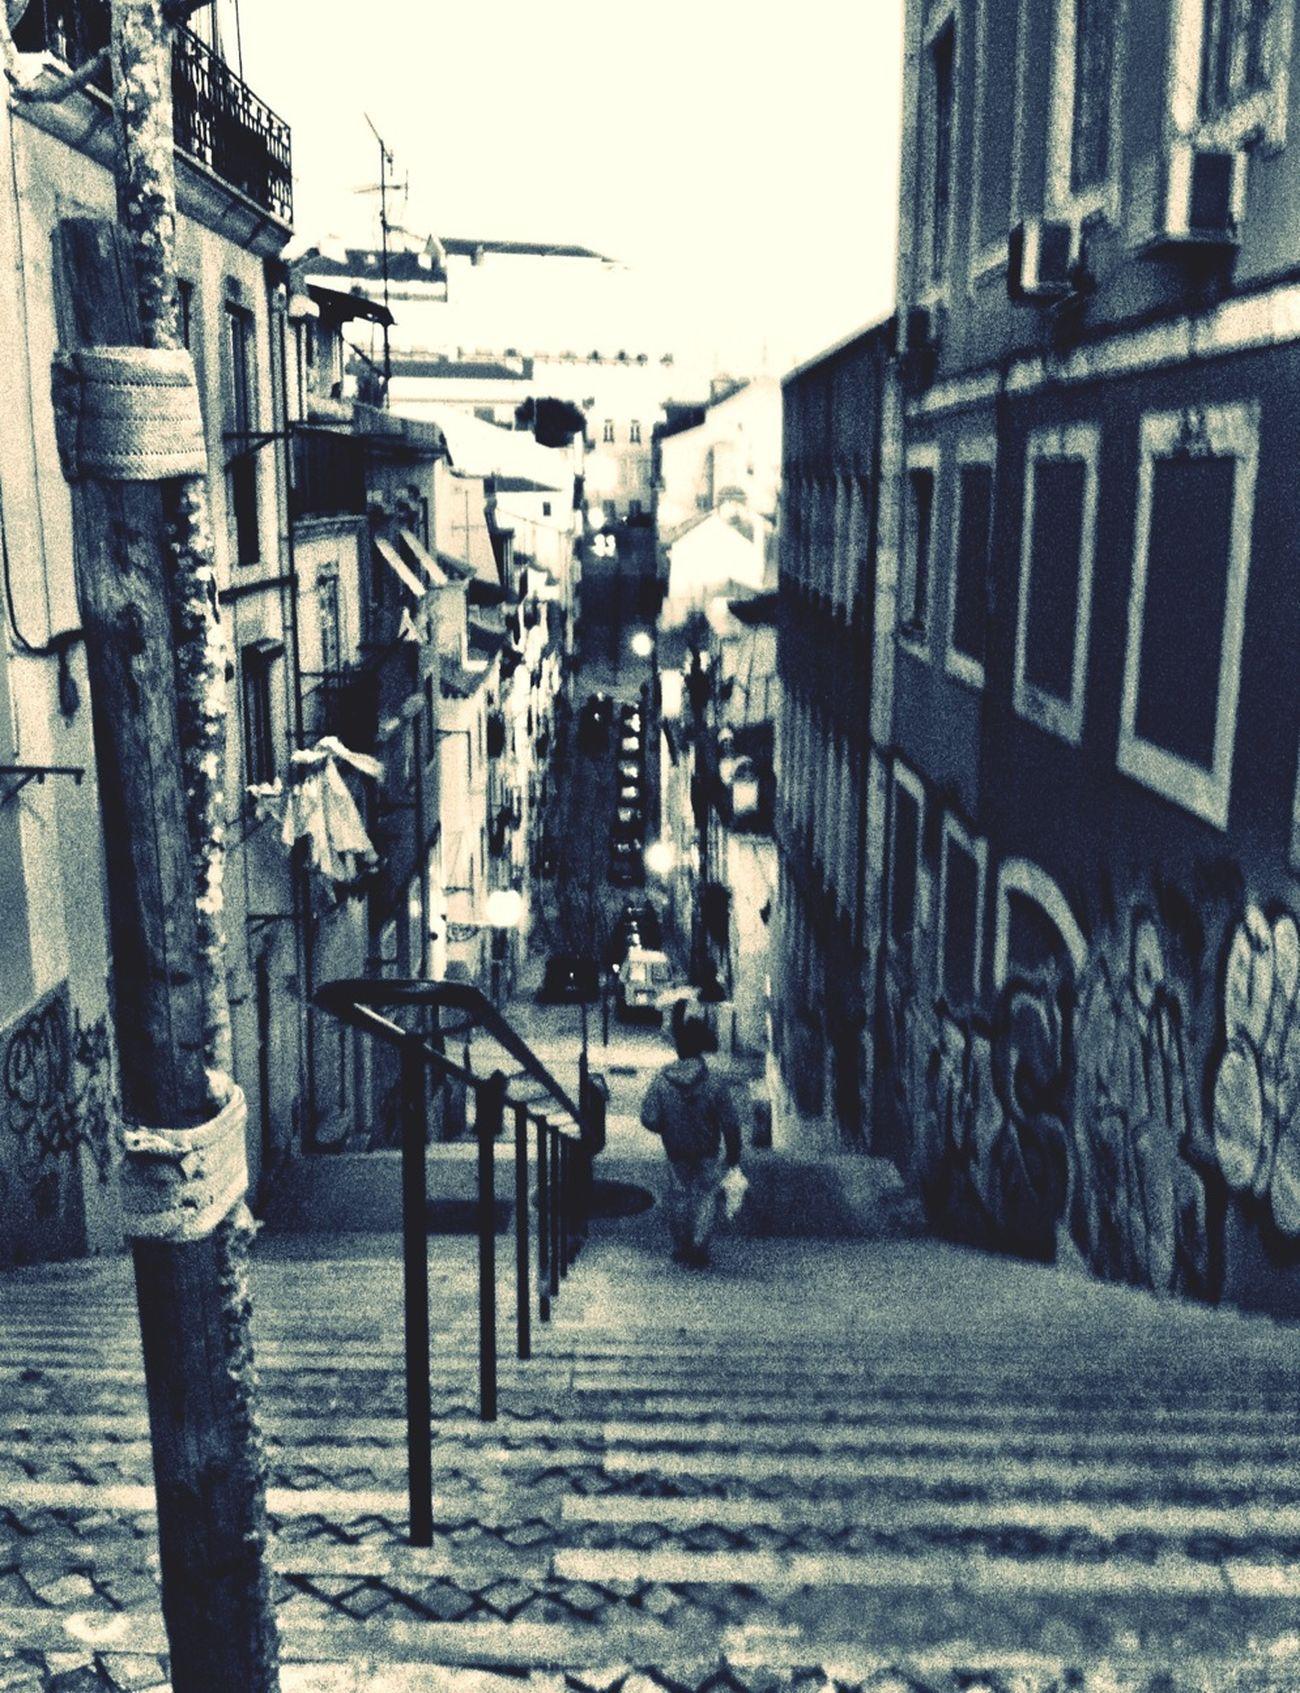 Downside Up Stairs Lisboa Streetphoto_bw Portugaloteuolhar